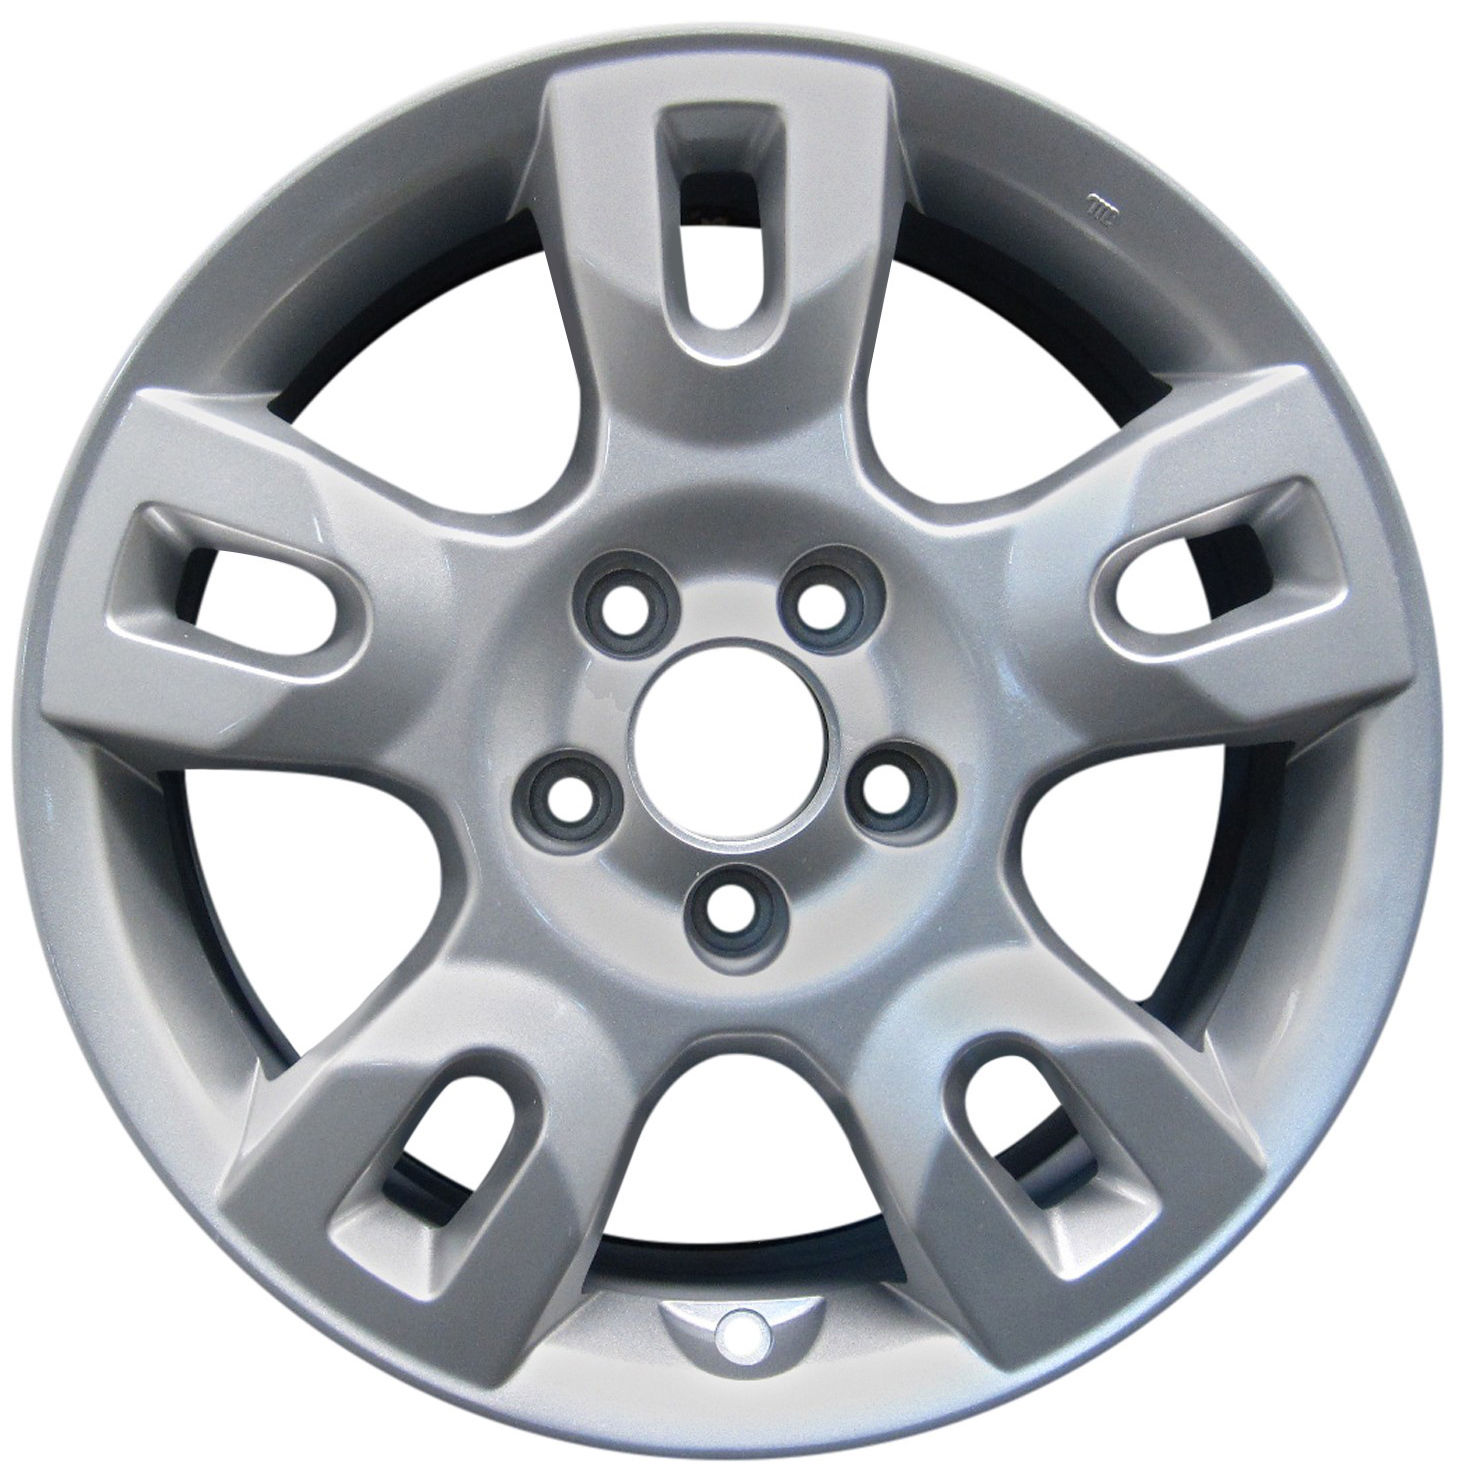 "17"" 17x6.5 OEM Alloy Wheel Rim For 2004 2005 2006 Acura"